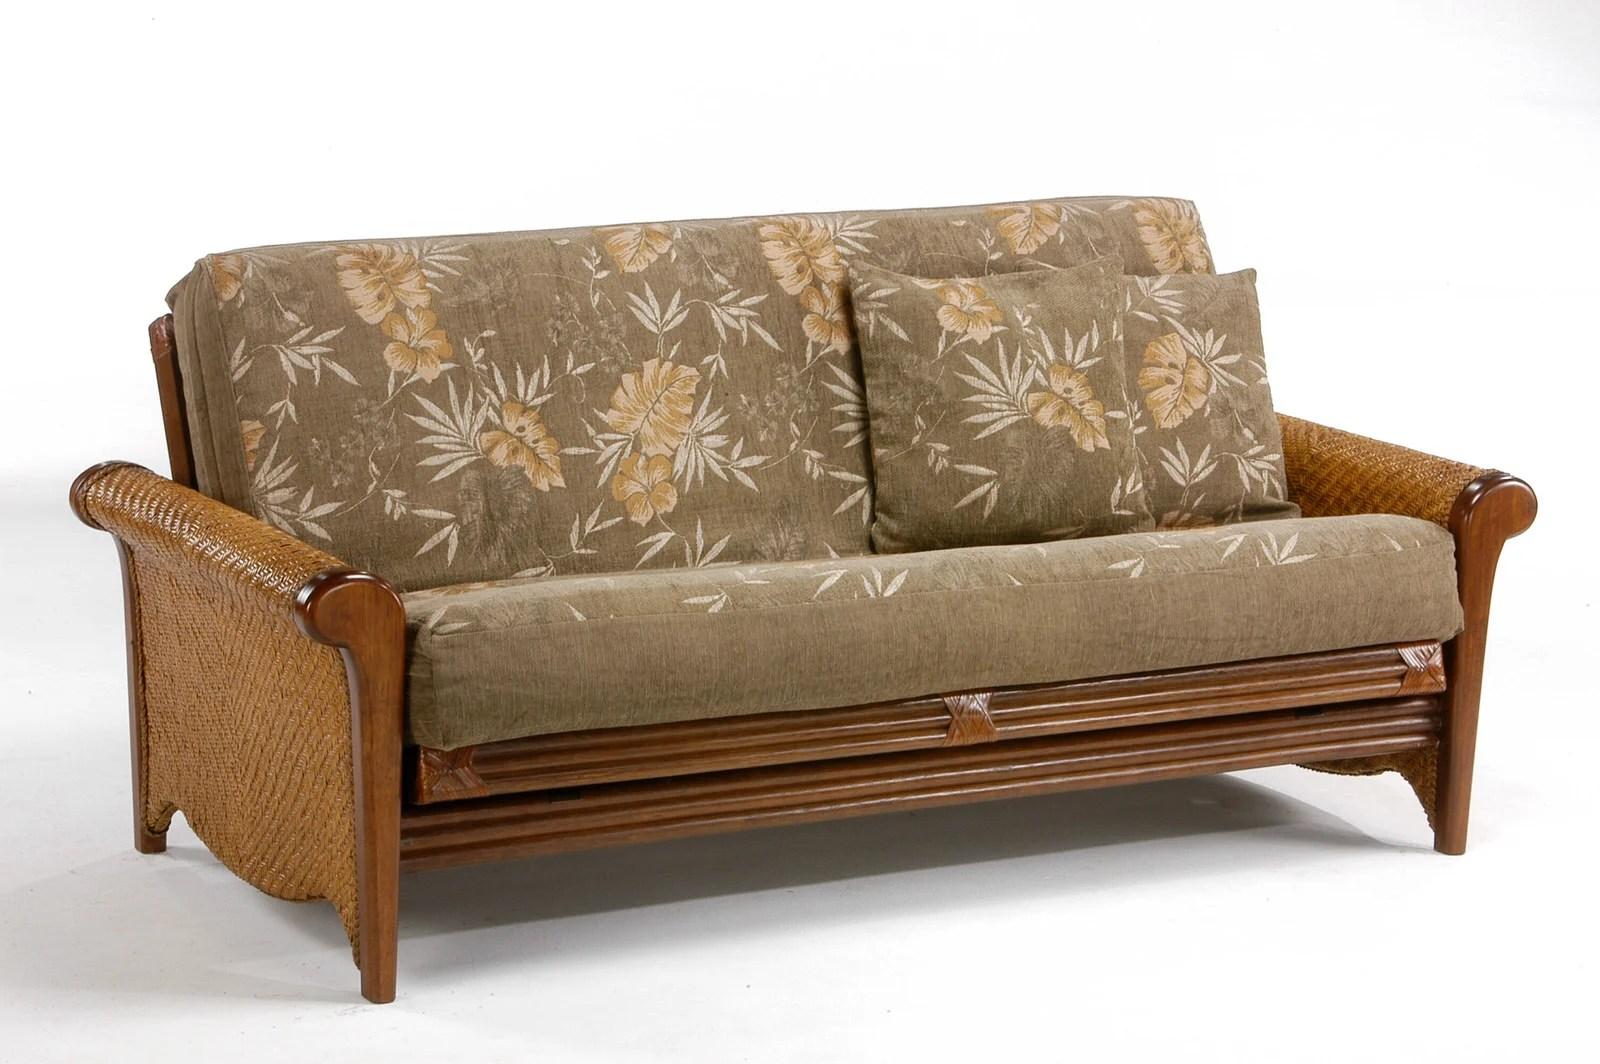 modern sofa bed new york table long rosebud rattan futon frame by night&day furniture